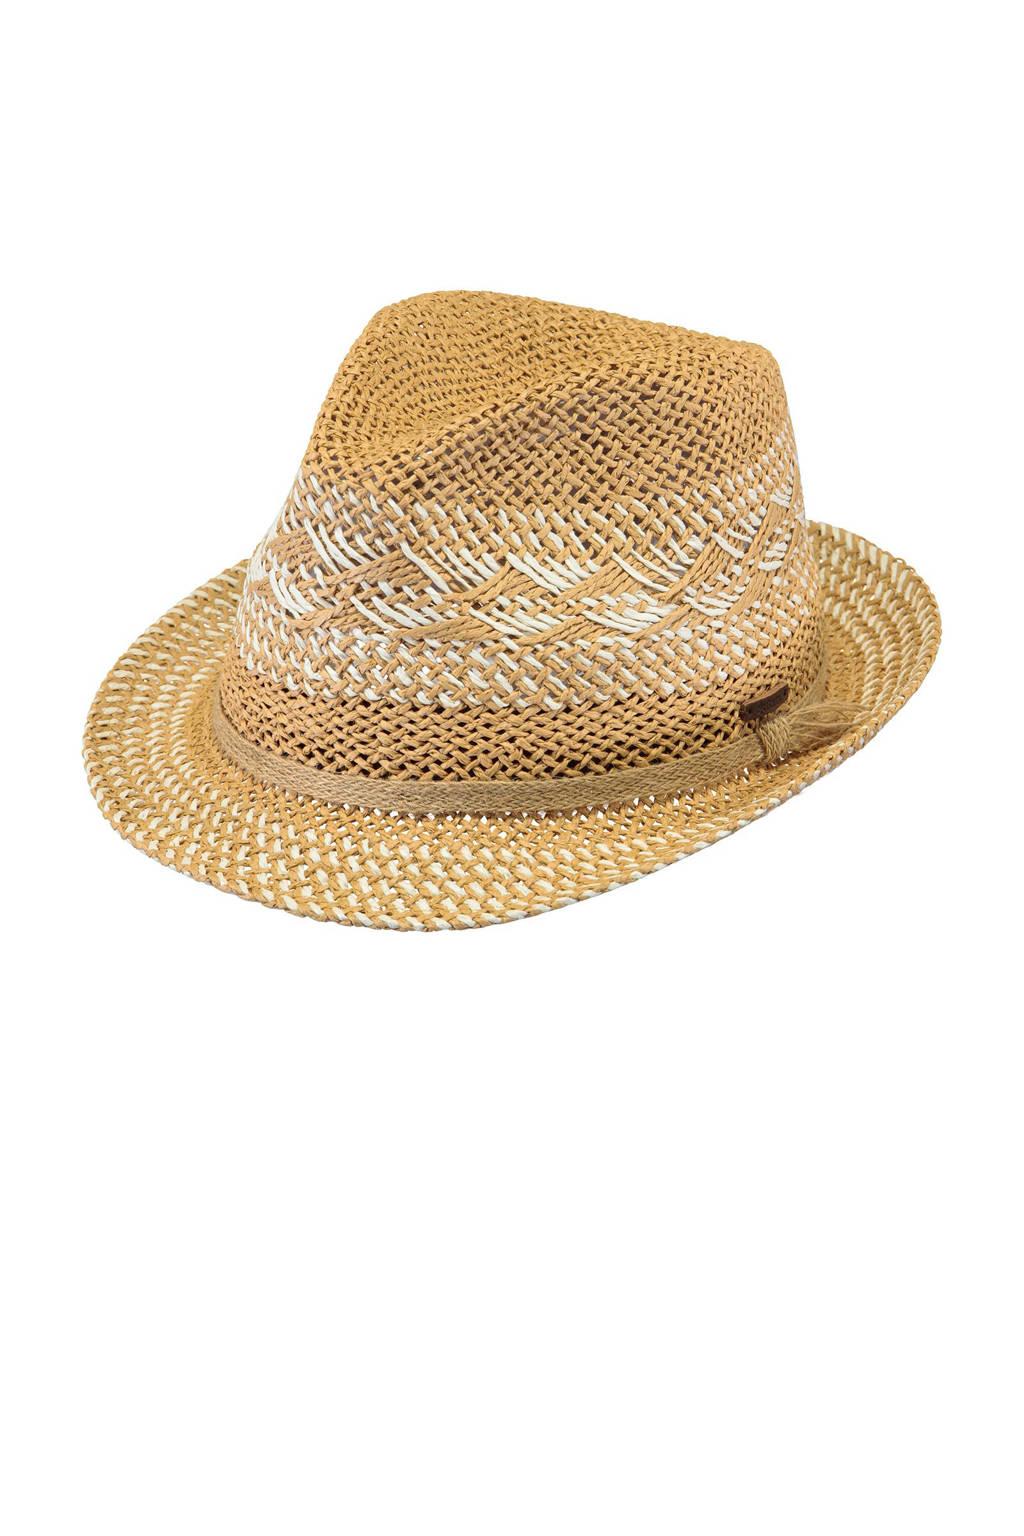 Barts hoed Tarragon Hat, Ecru